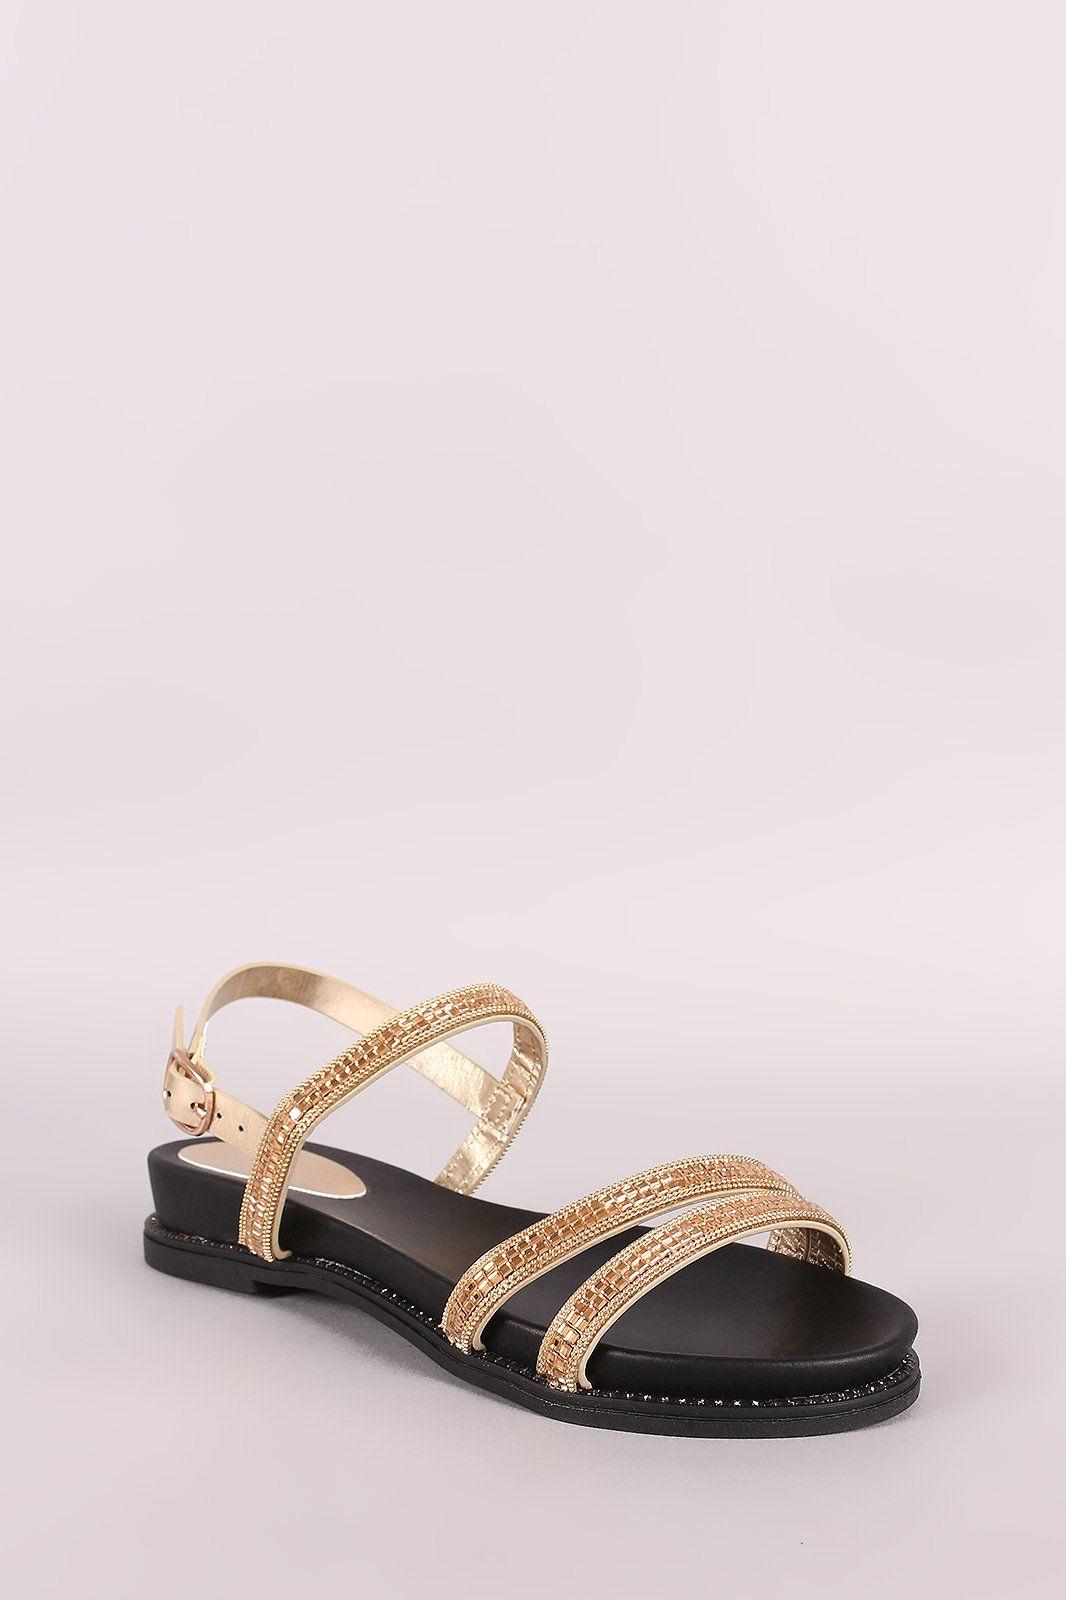 1e7a30ea8b0504 Bamboo Rhinestone Embellished Triple Band Slingback Flat Sandal ...